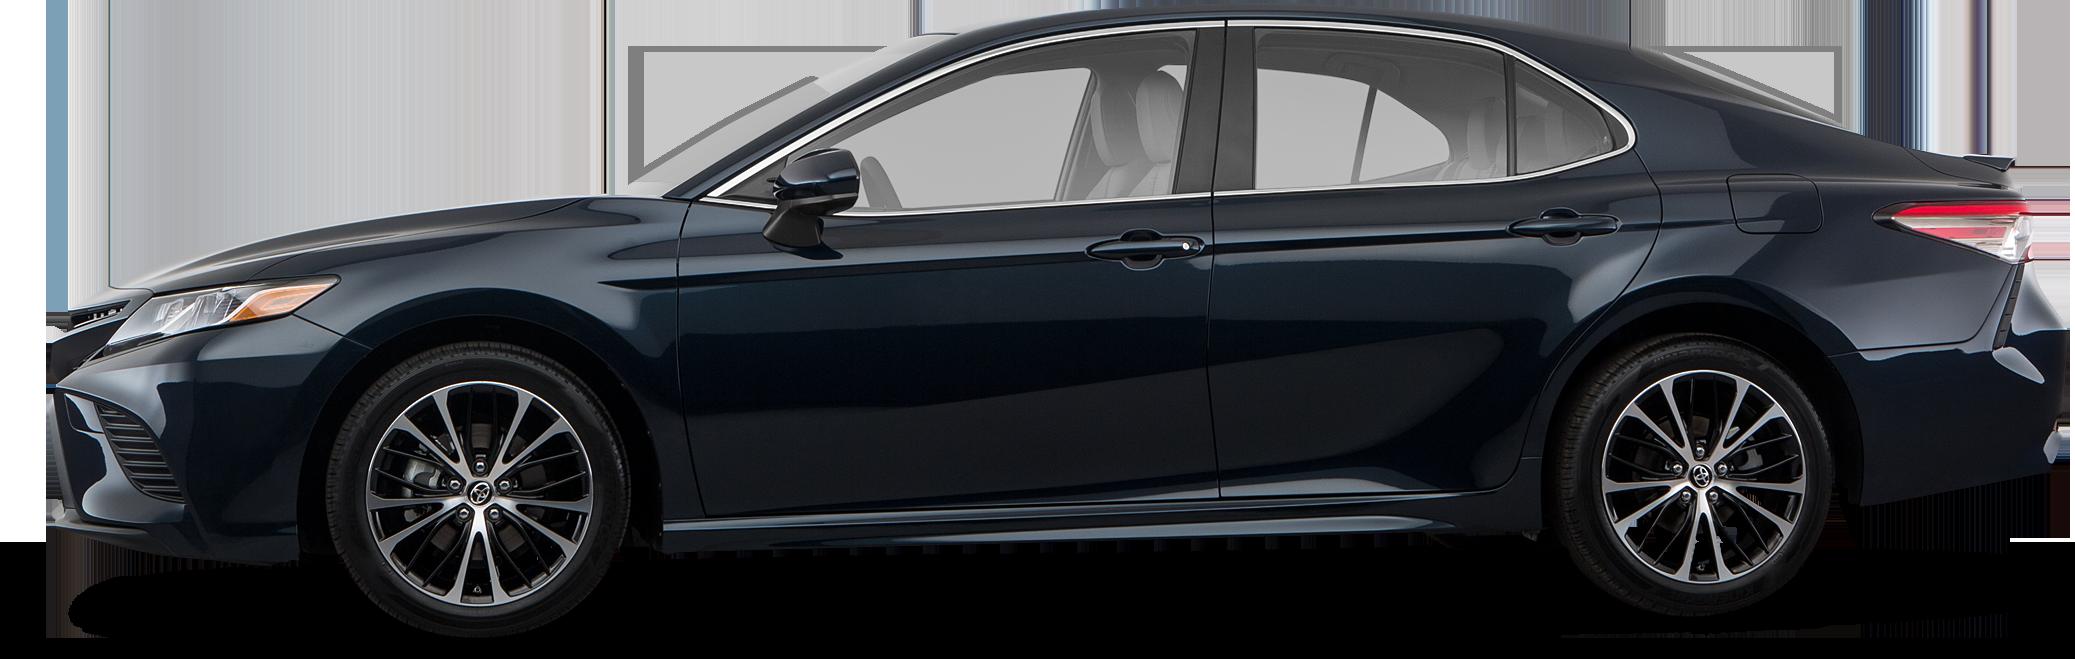 2020 Toyota Camry Sedan SE